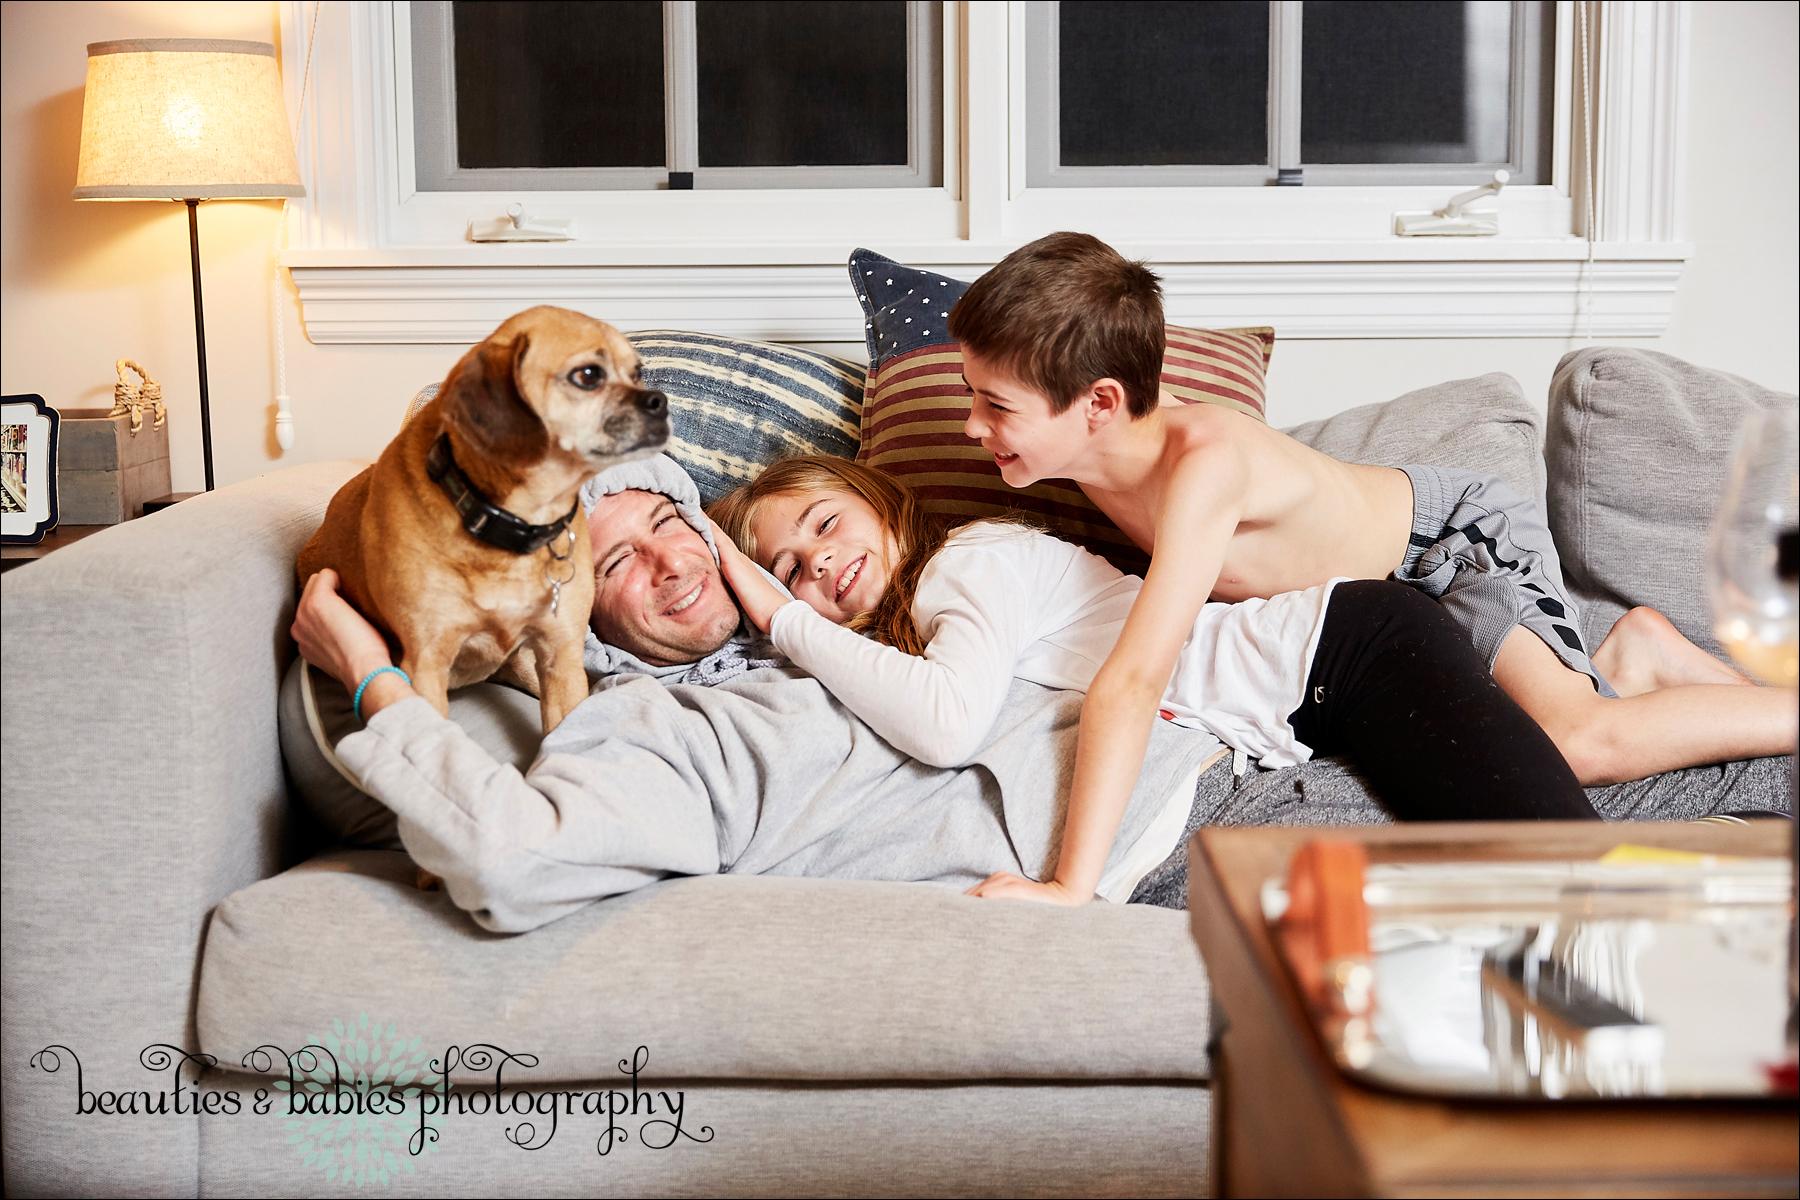 Days in quarantine for Coronavirus family photographer